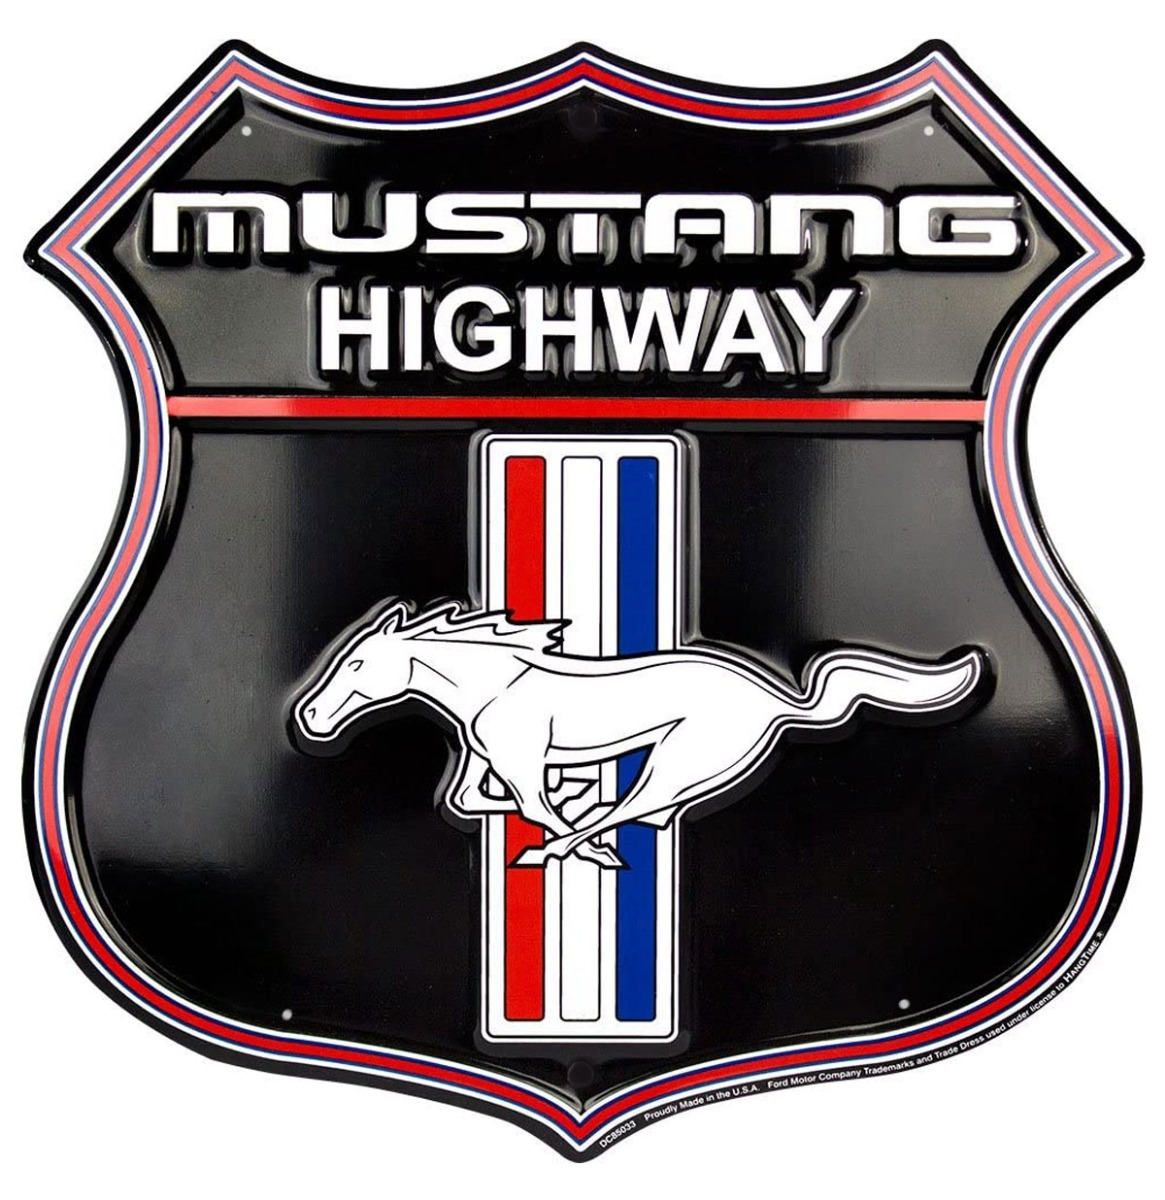 Ford Mustang Highway Metalen Bord 60 x 58 cm